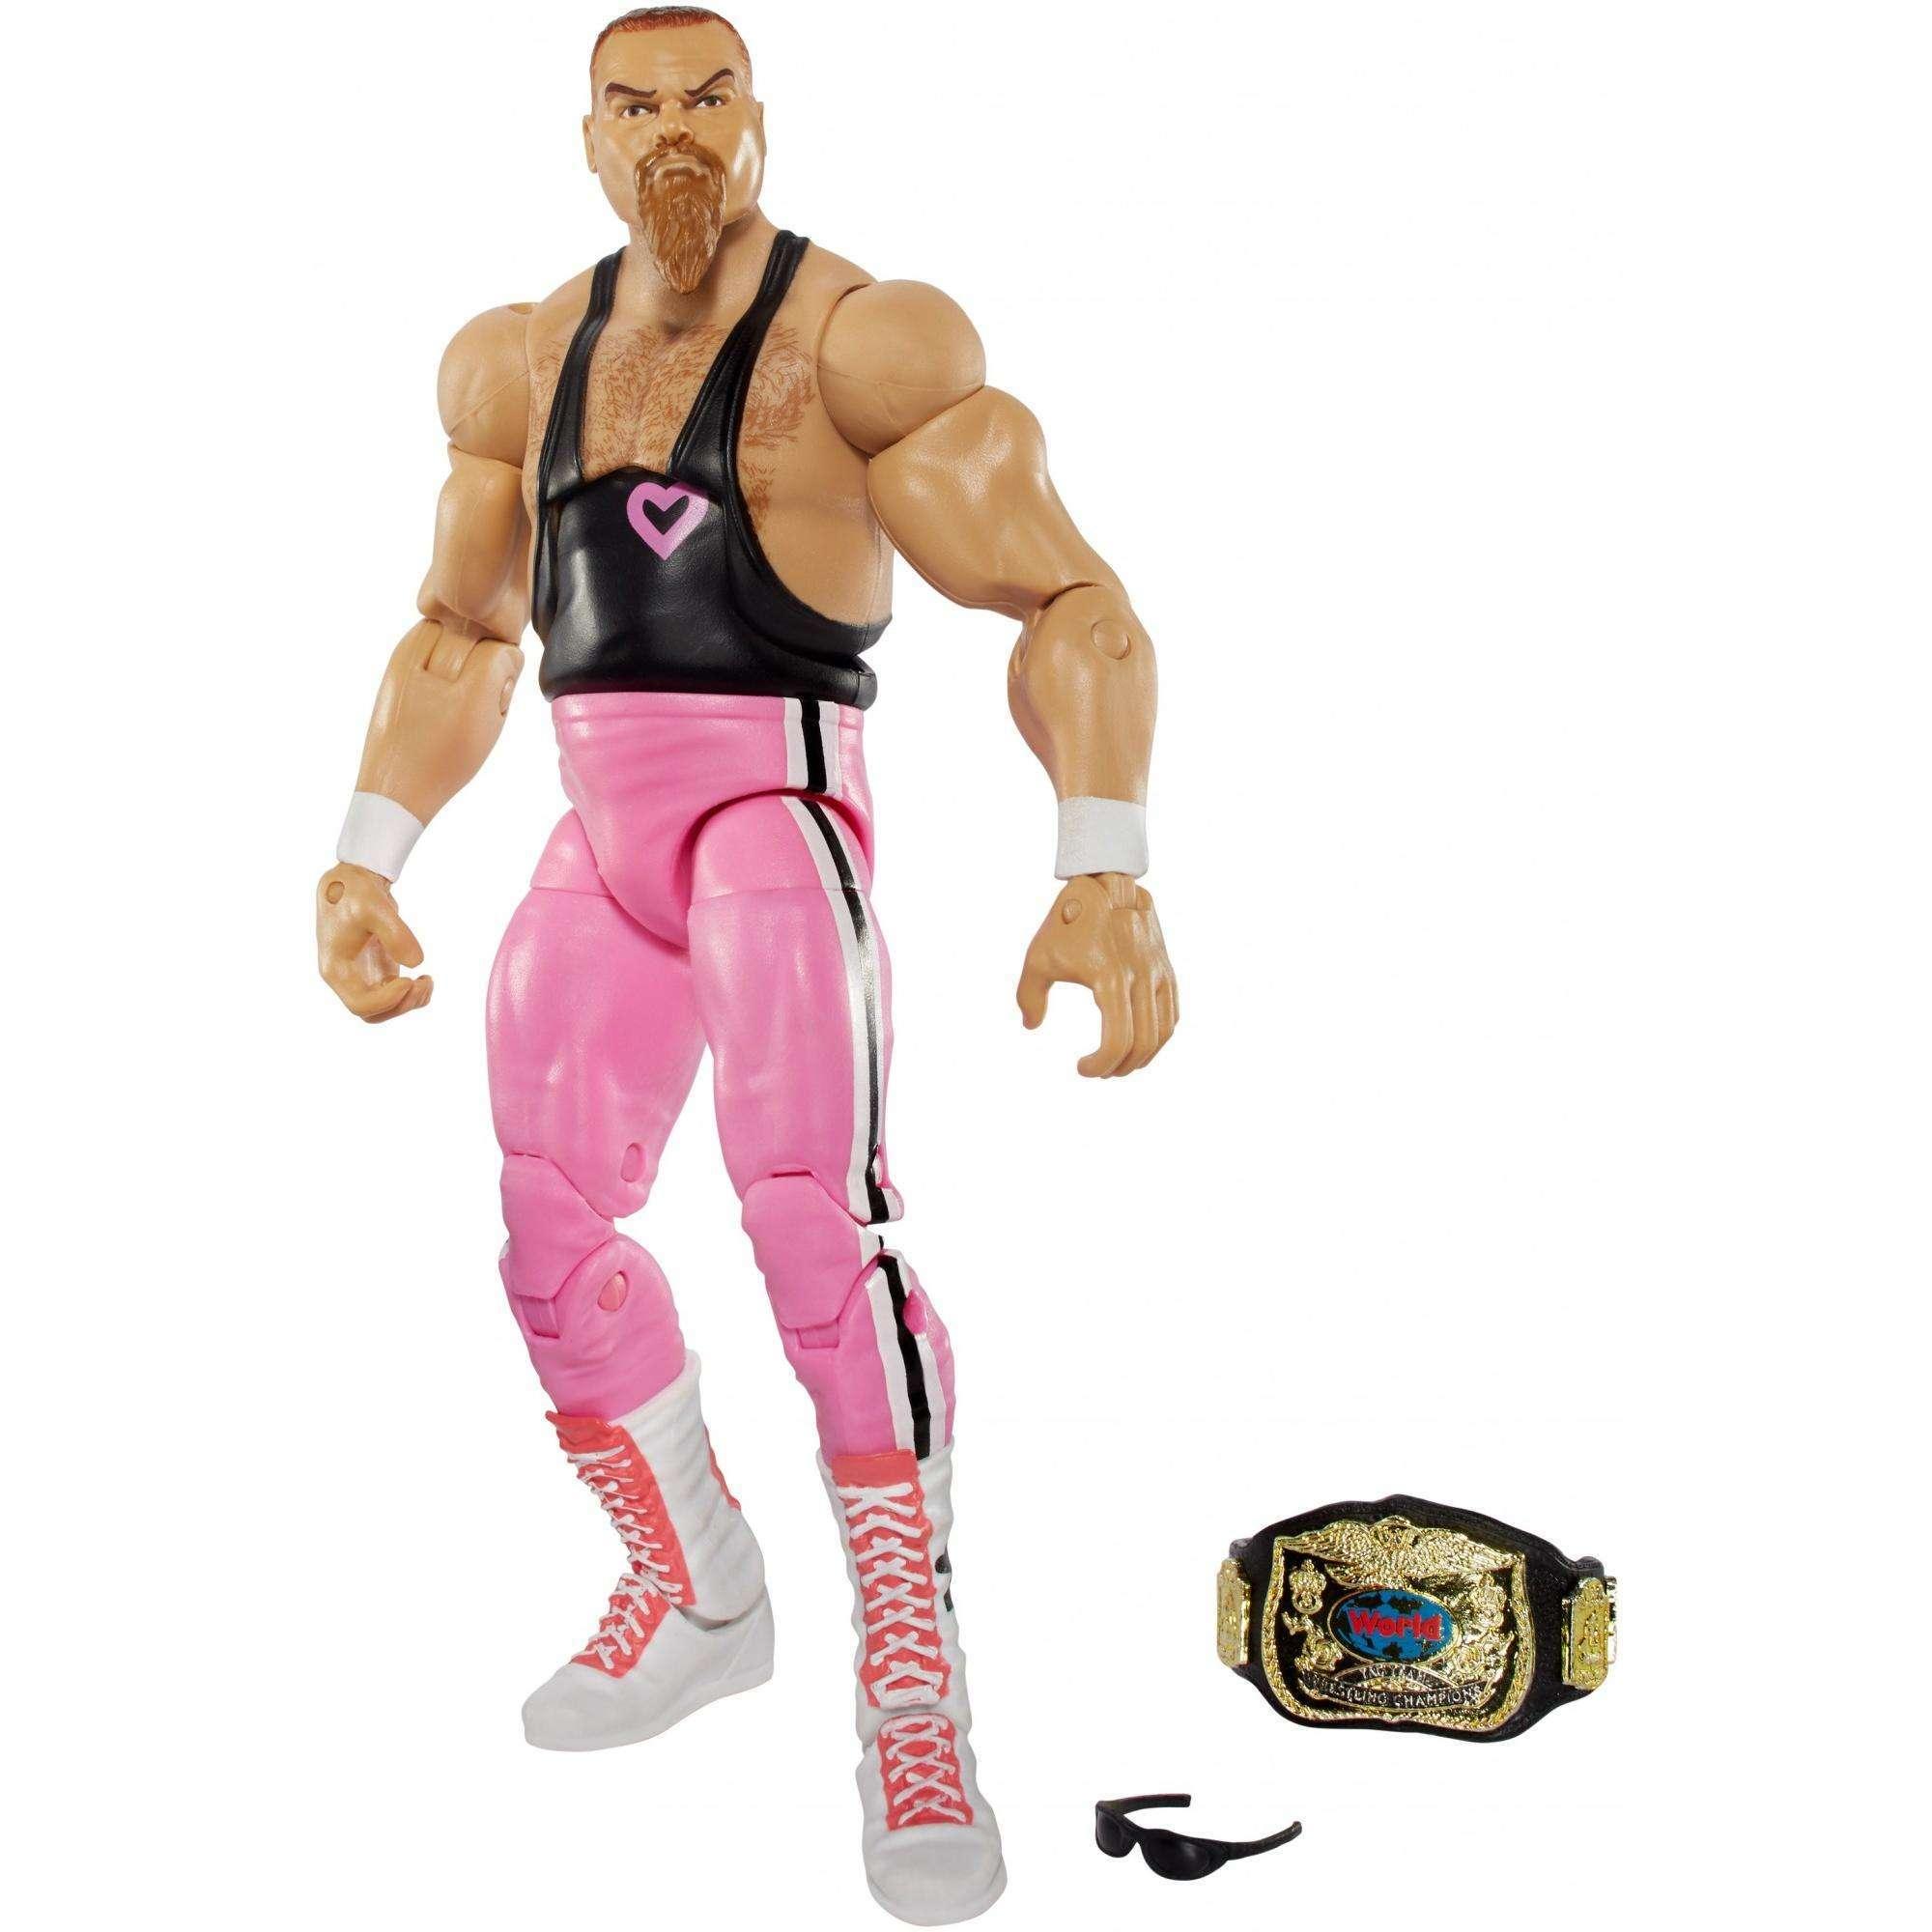 WWE Elite Jim Neidhart Action Figure by Mattel